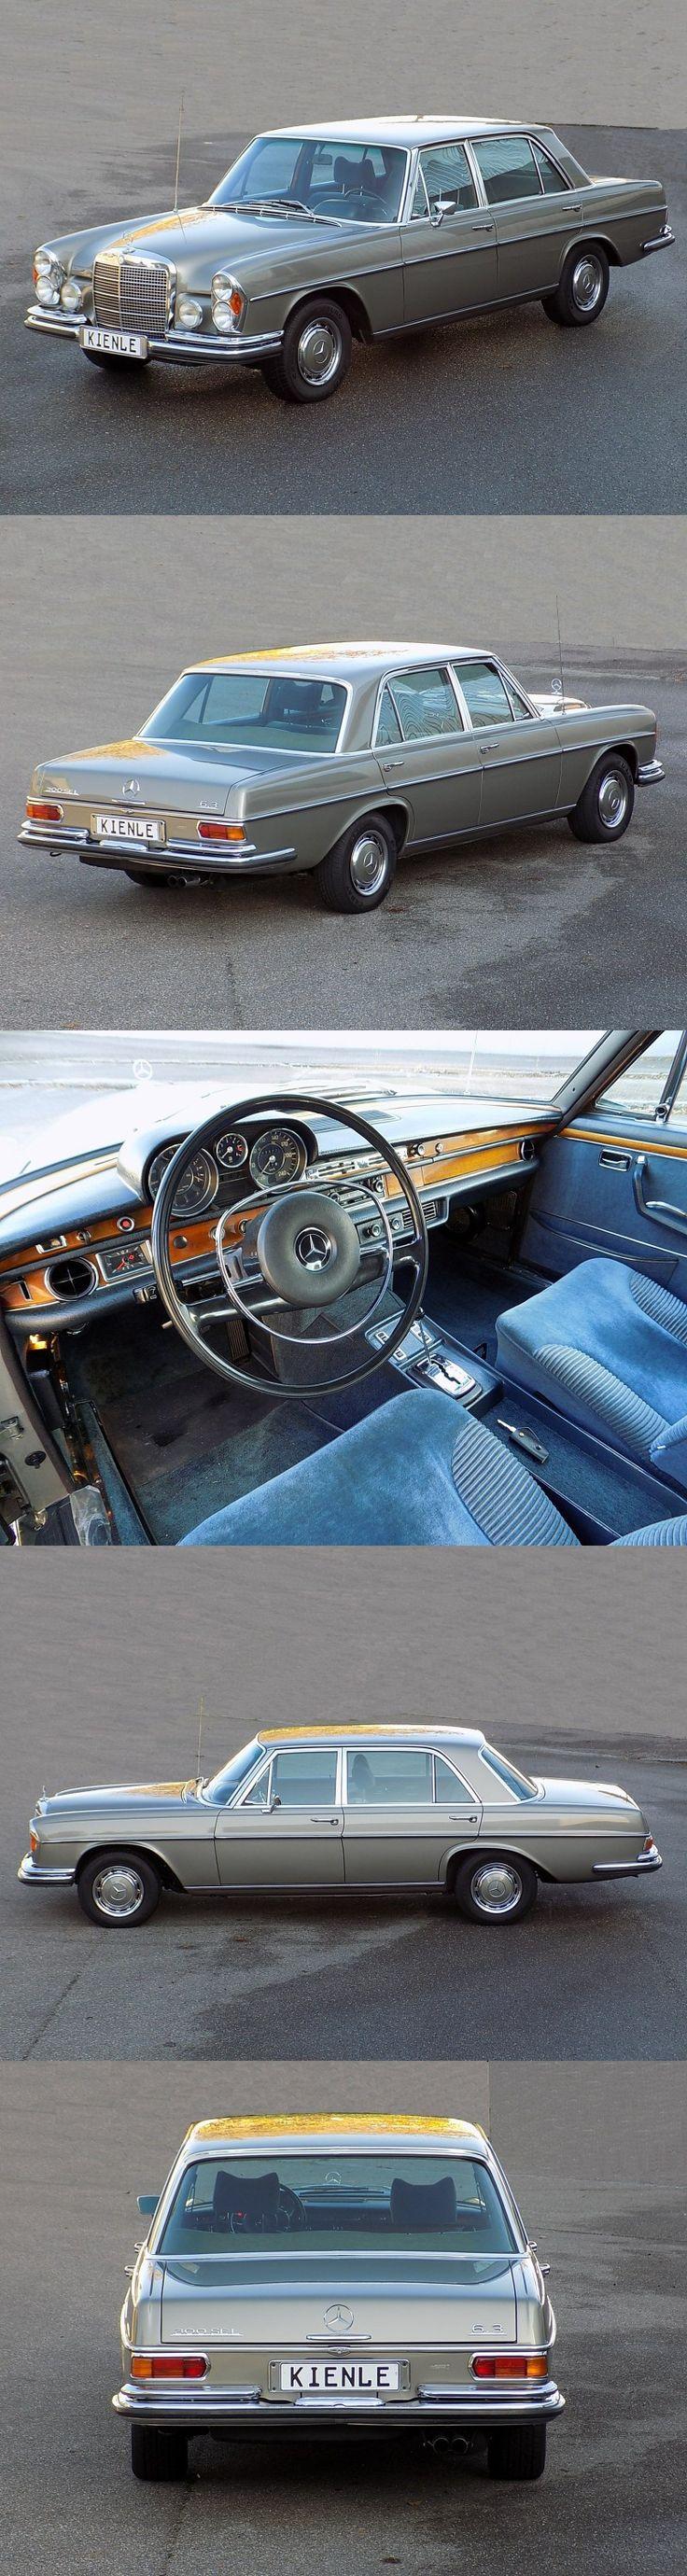 1969 mercedes benz 300 sel 6 3 saloon